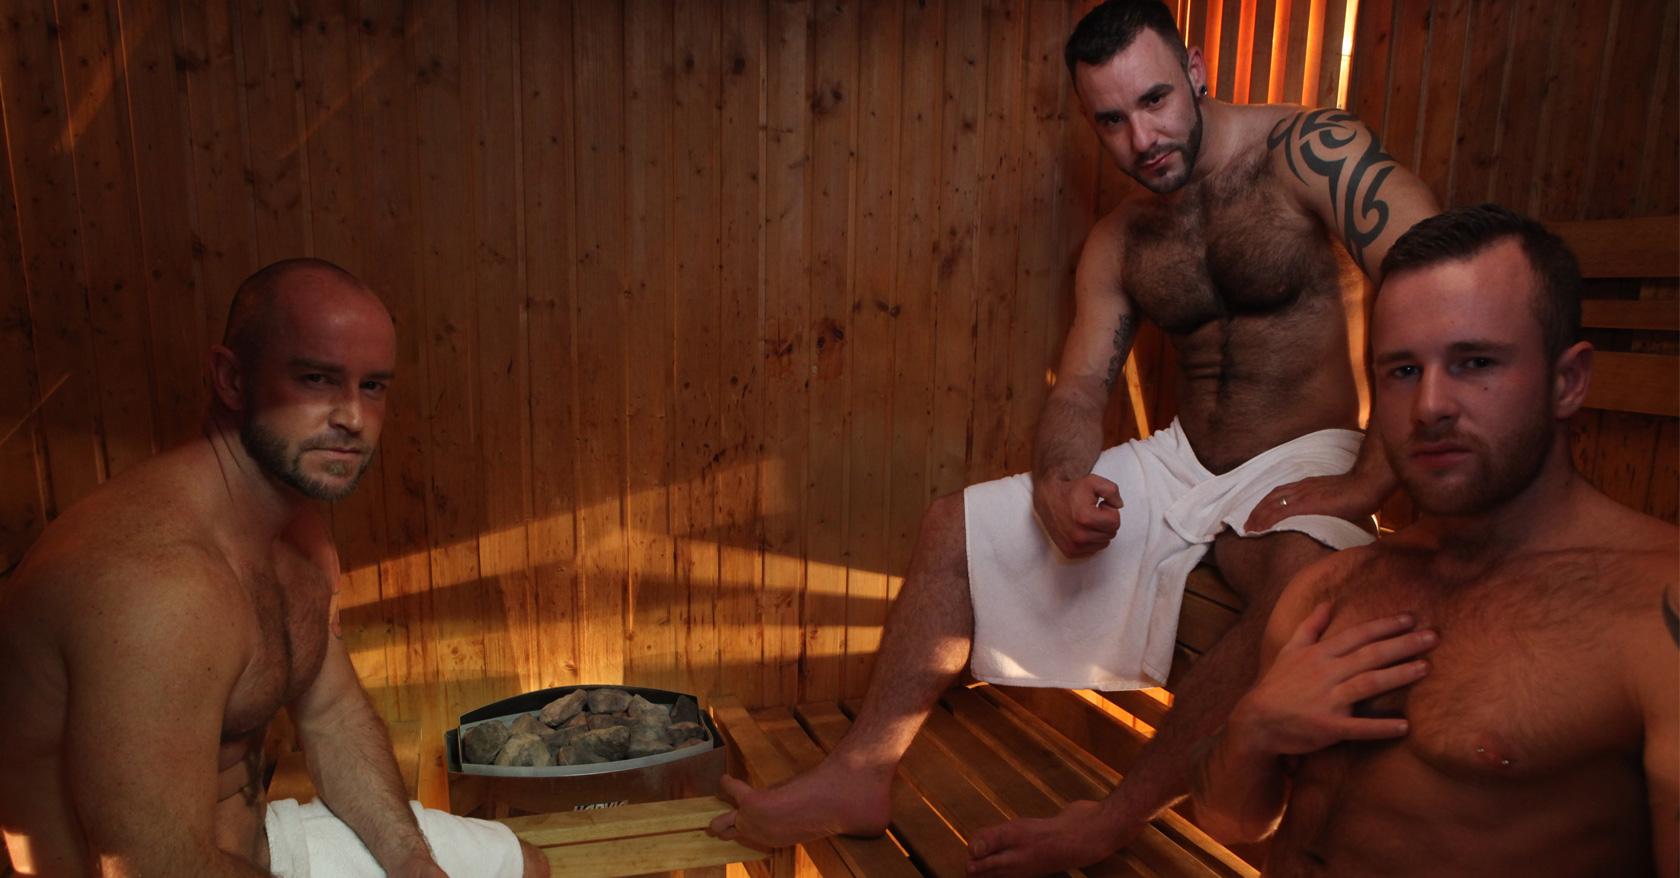 Voda spa sauna, moscow